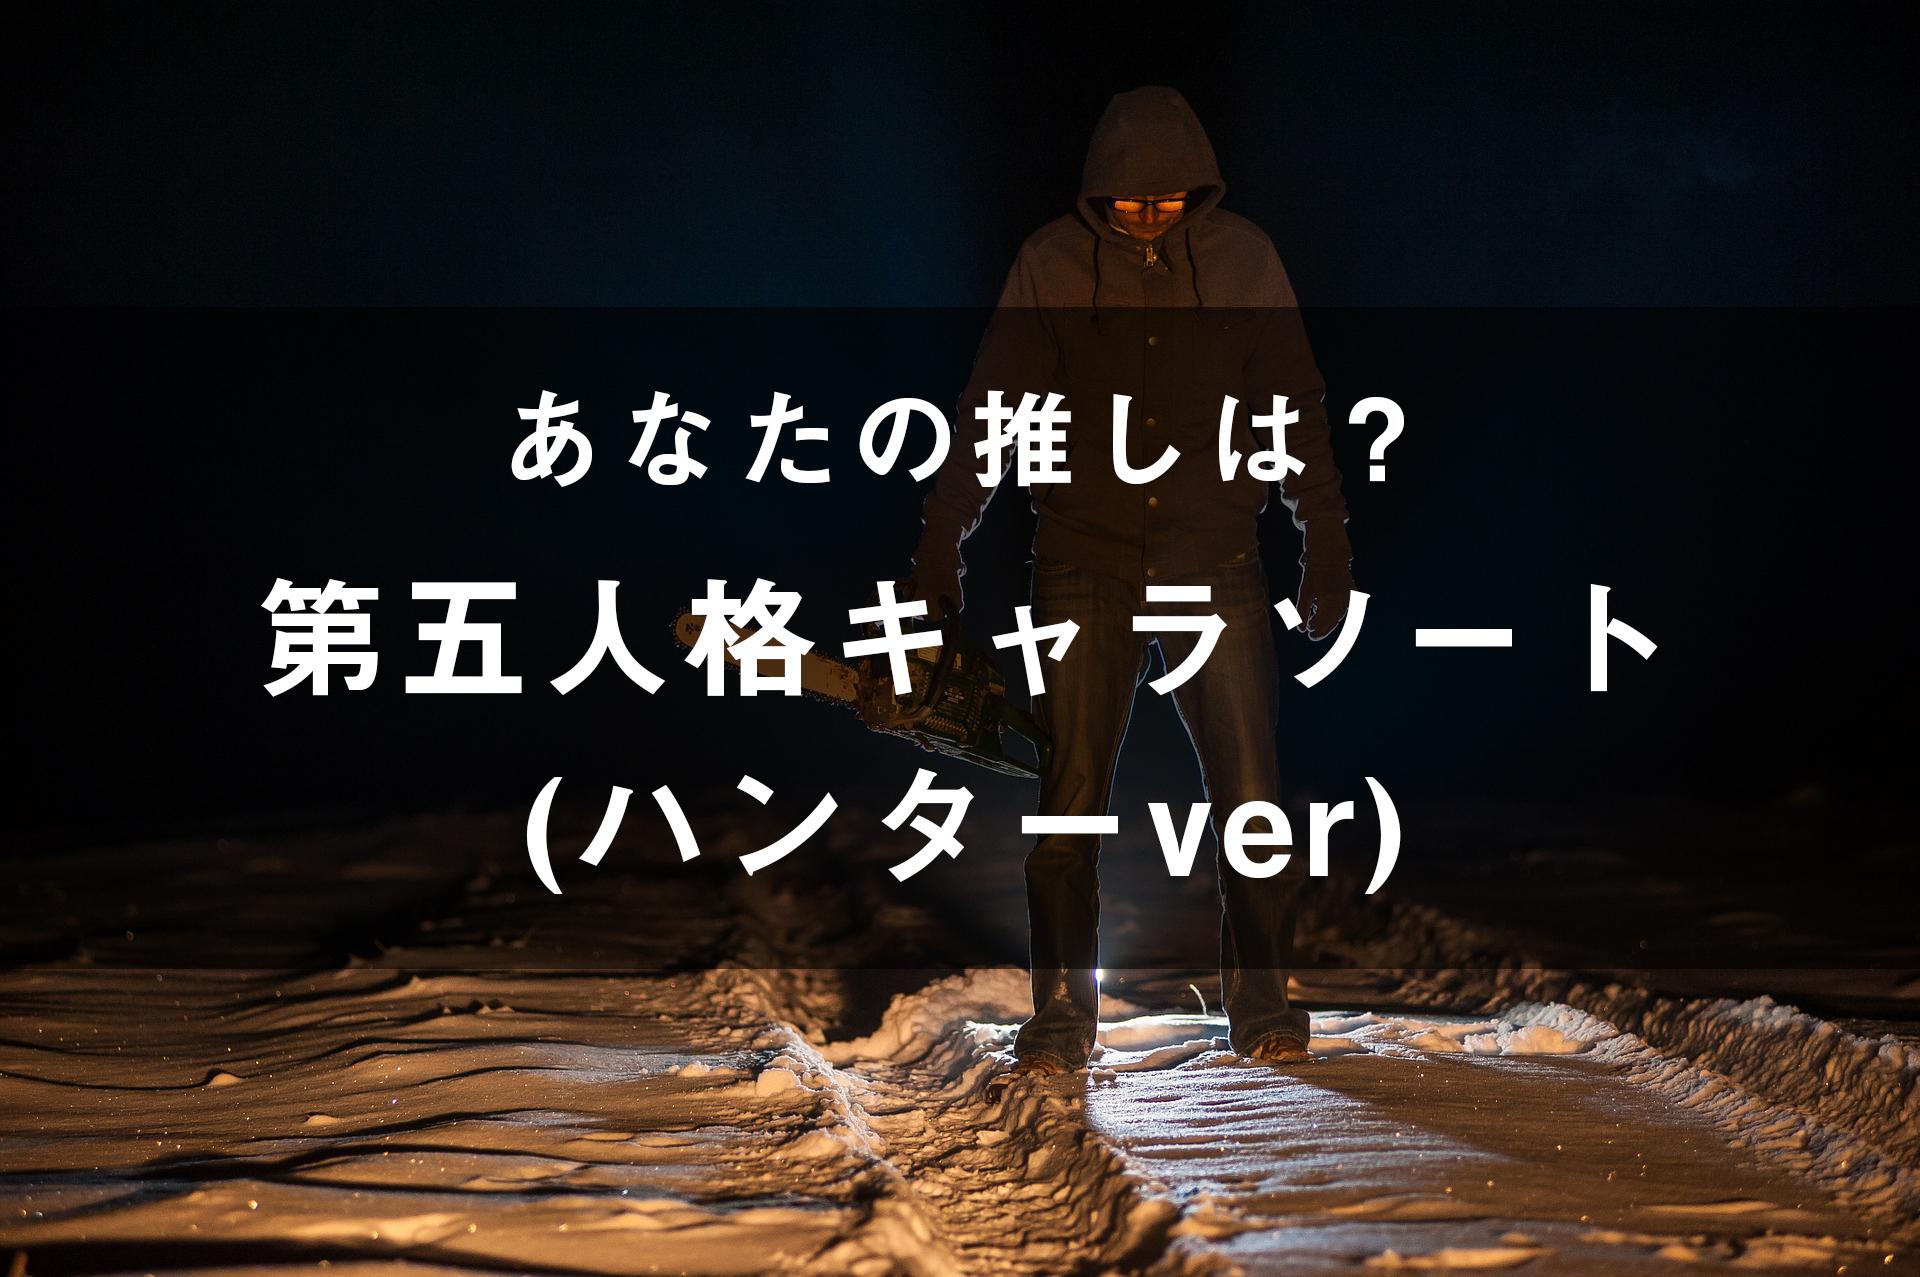 「IdentityV (第五人格)~ハンターver.」のキャラソート(画像付き)